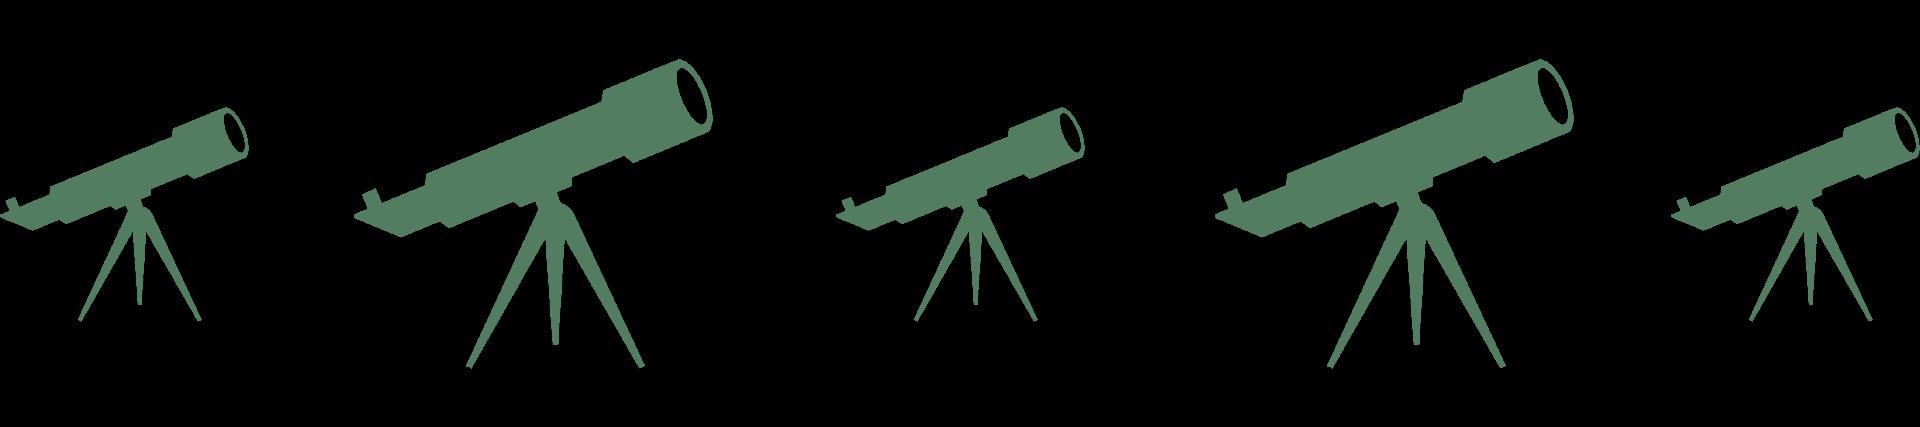 telescope divider 2